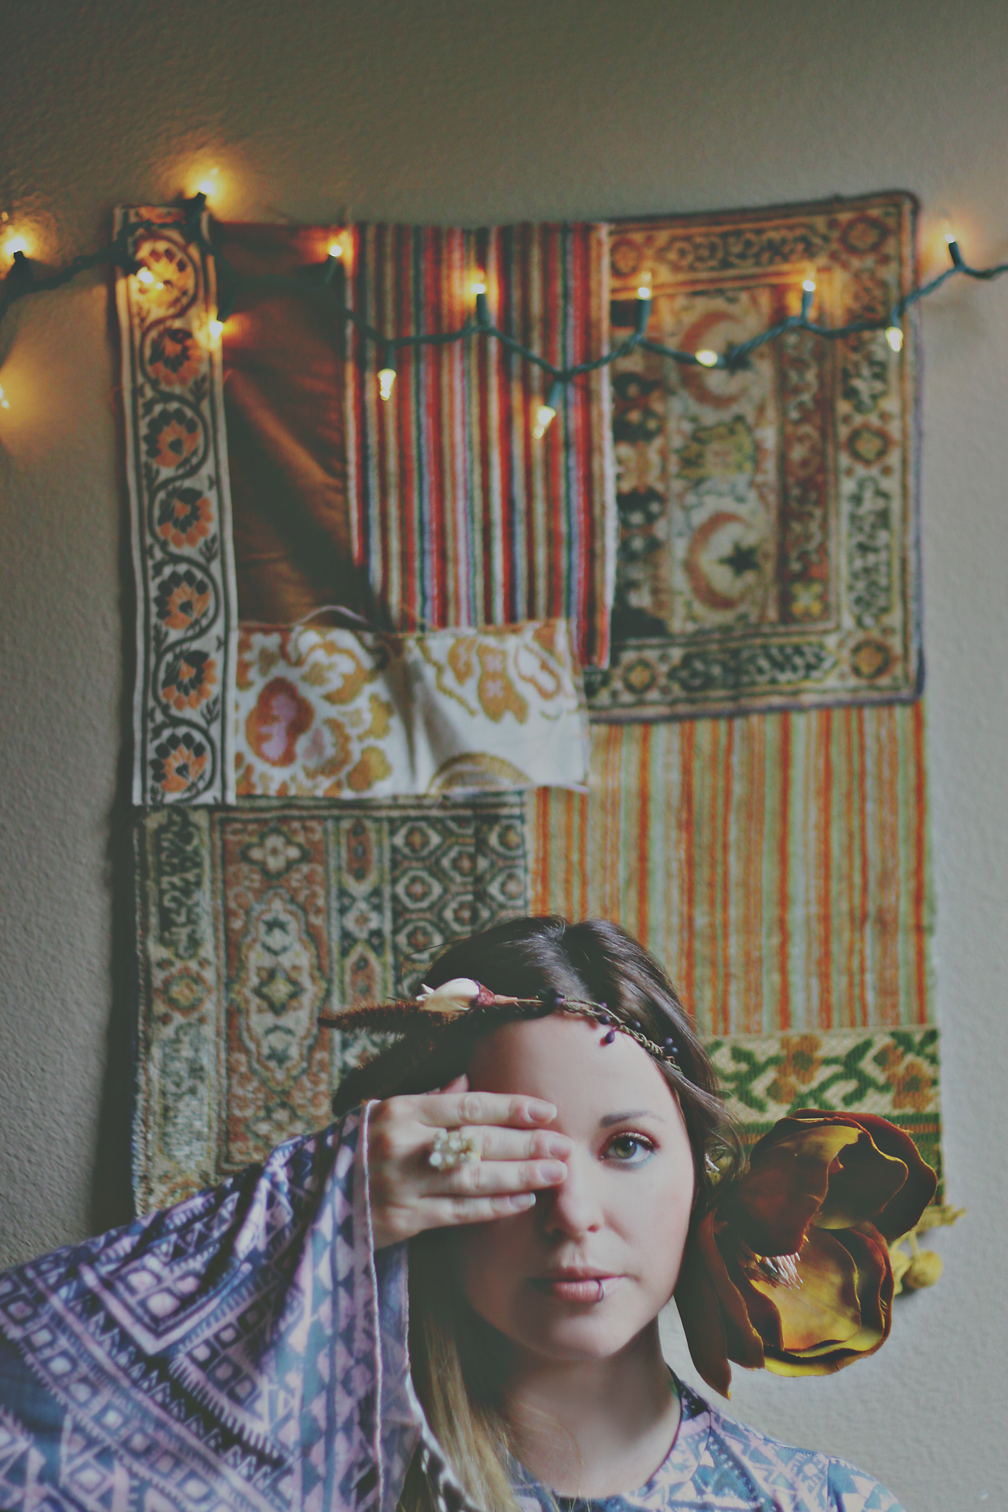 Lookbook via The Bohemian Collective